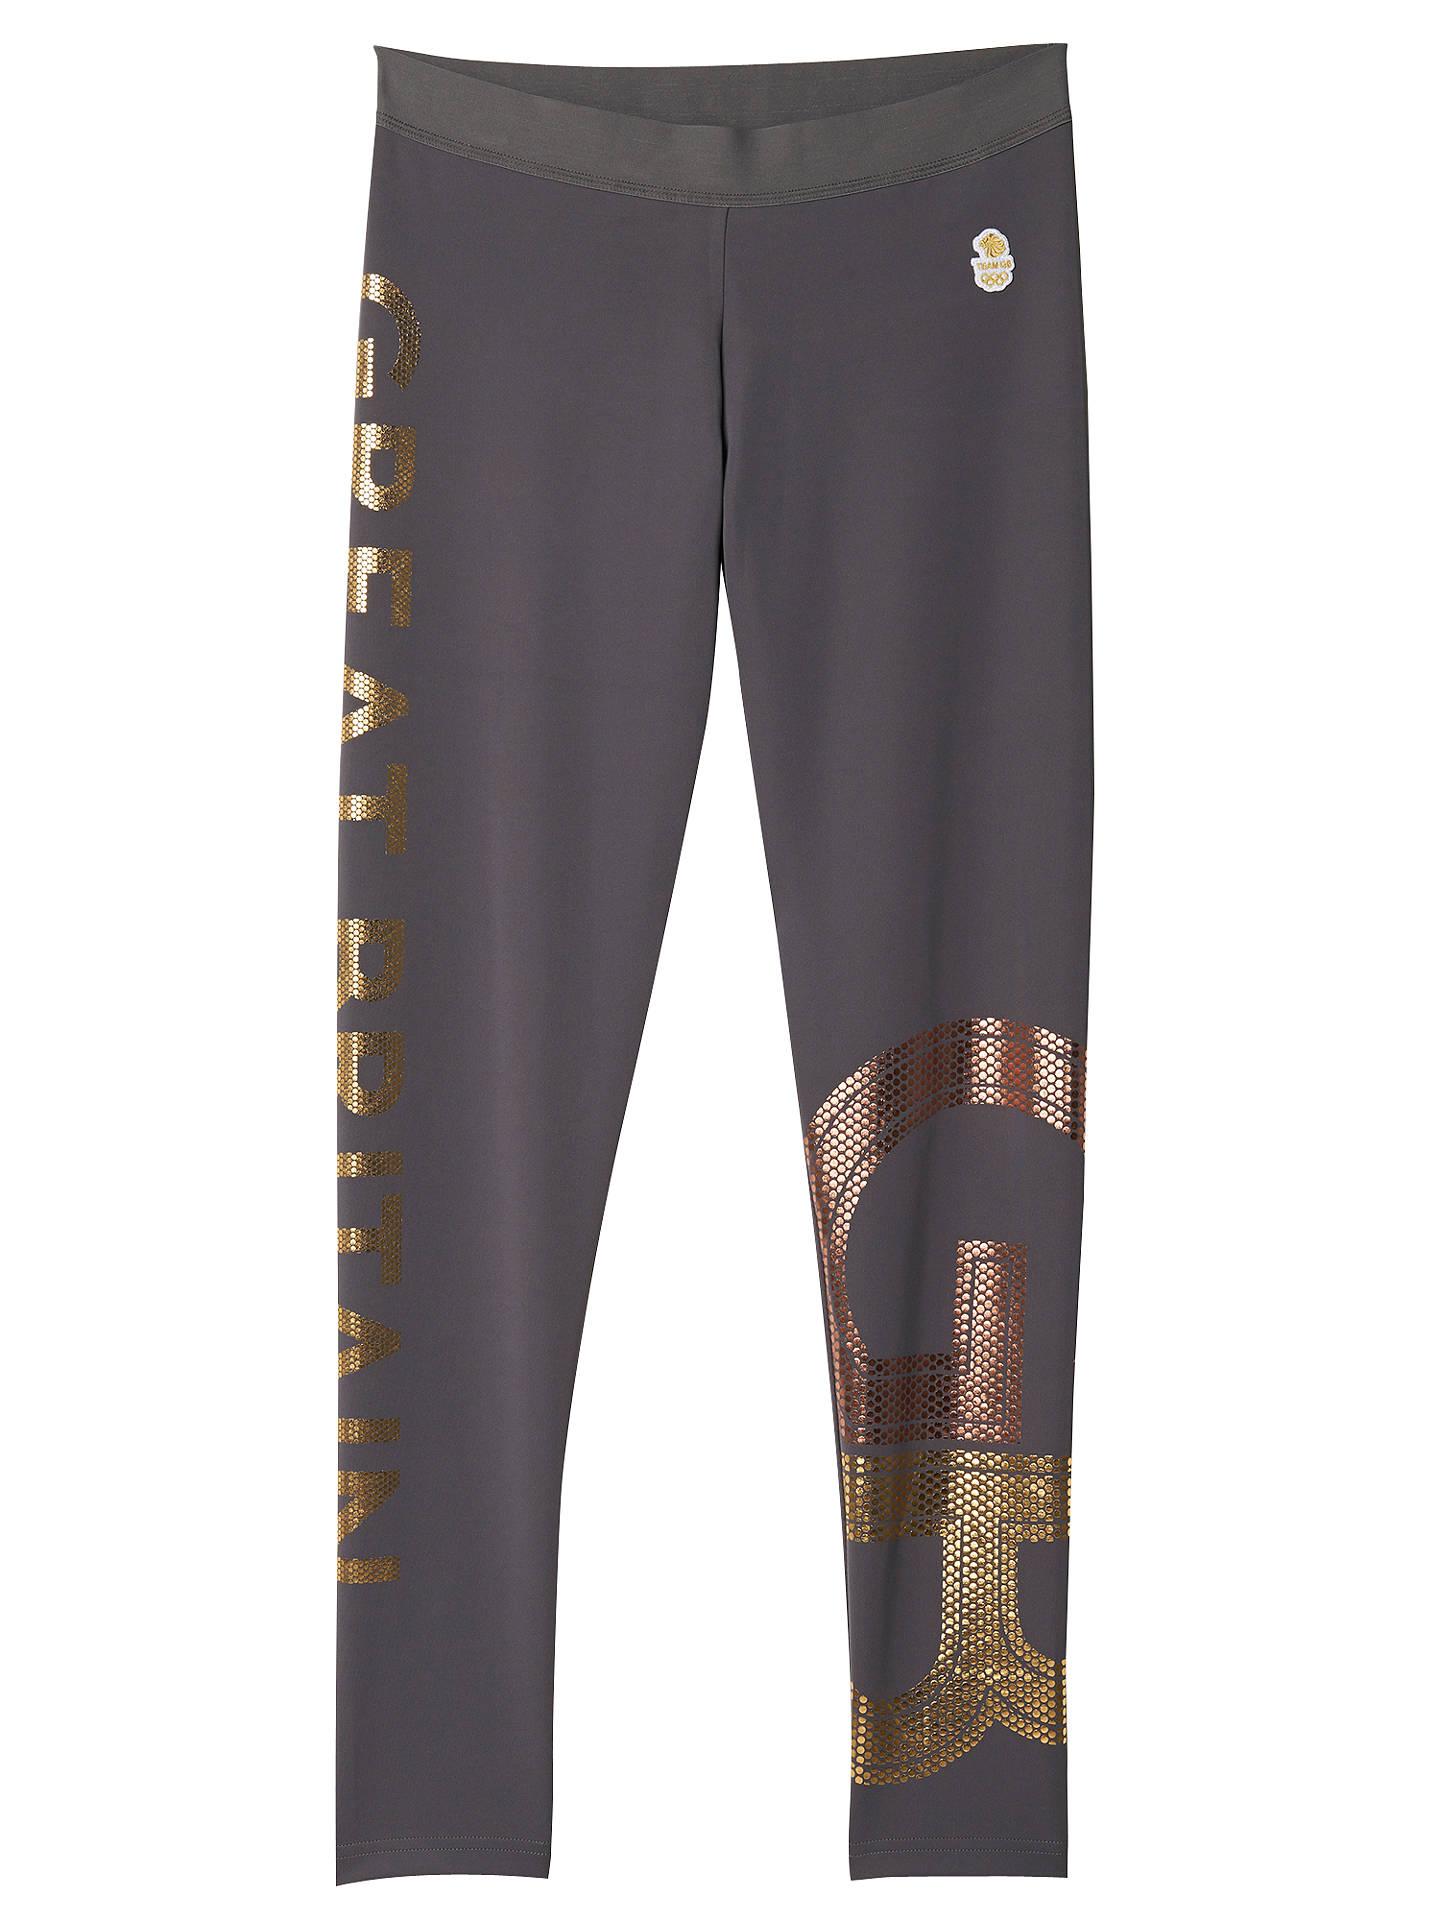 db0846ff93f99 Buy Adidas Stella McCartney Team GB Women's Training Tights, Granite/Gold,  XS Online ...